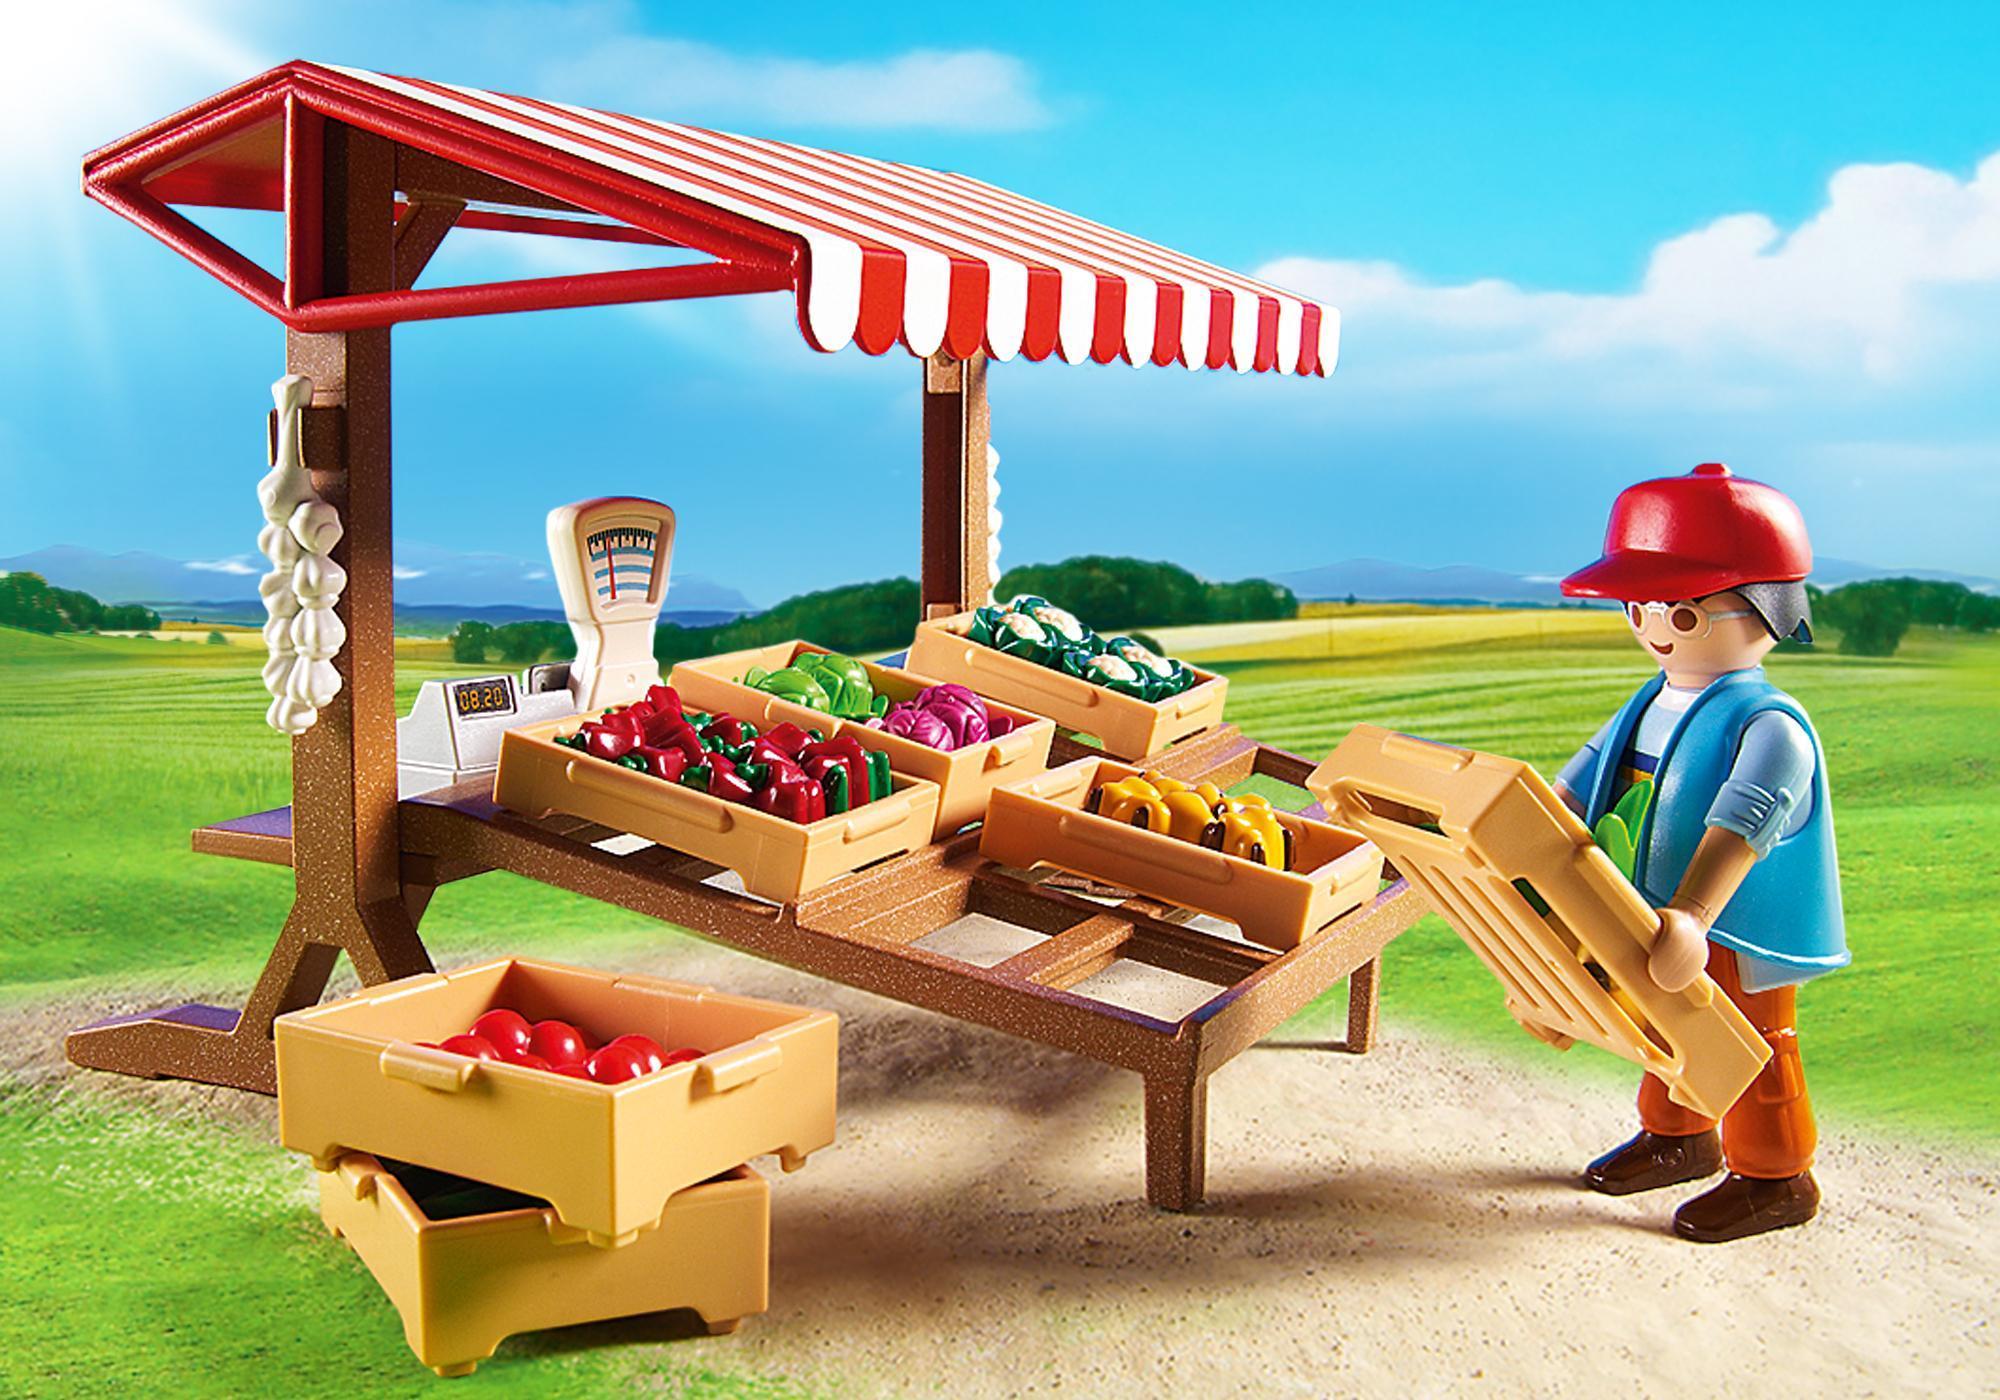 http://media.playmobil.com/i/playmobil/6121_product_extra2